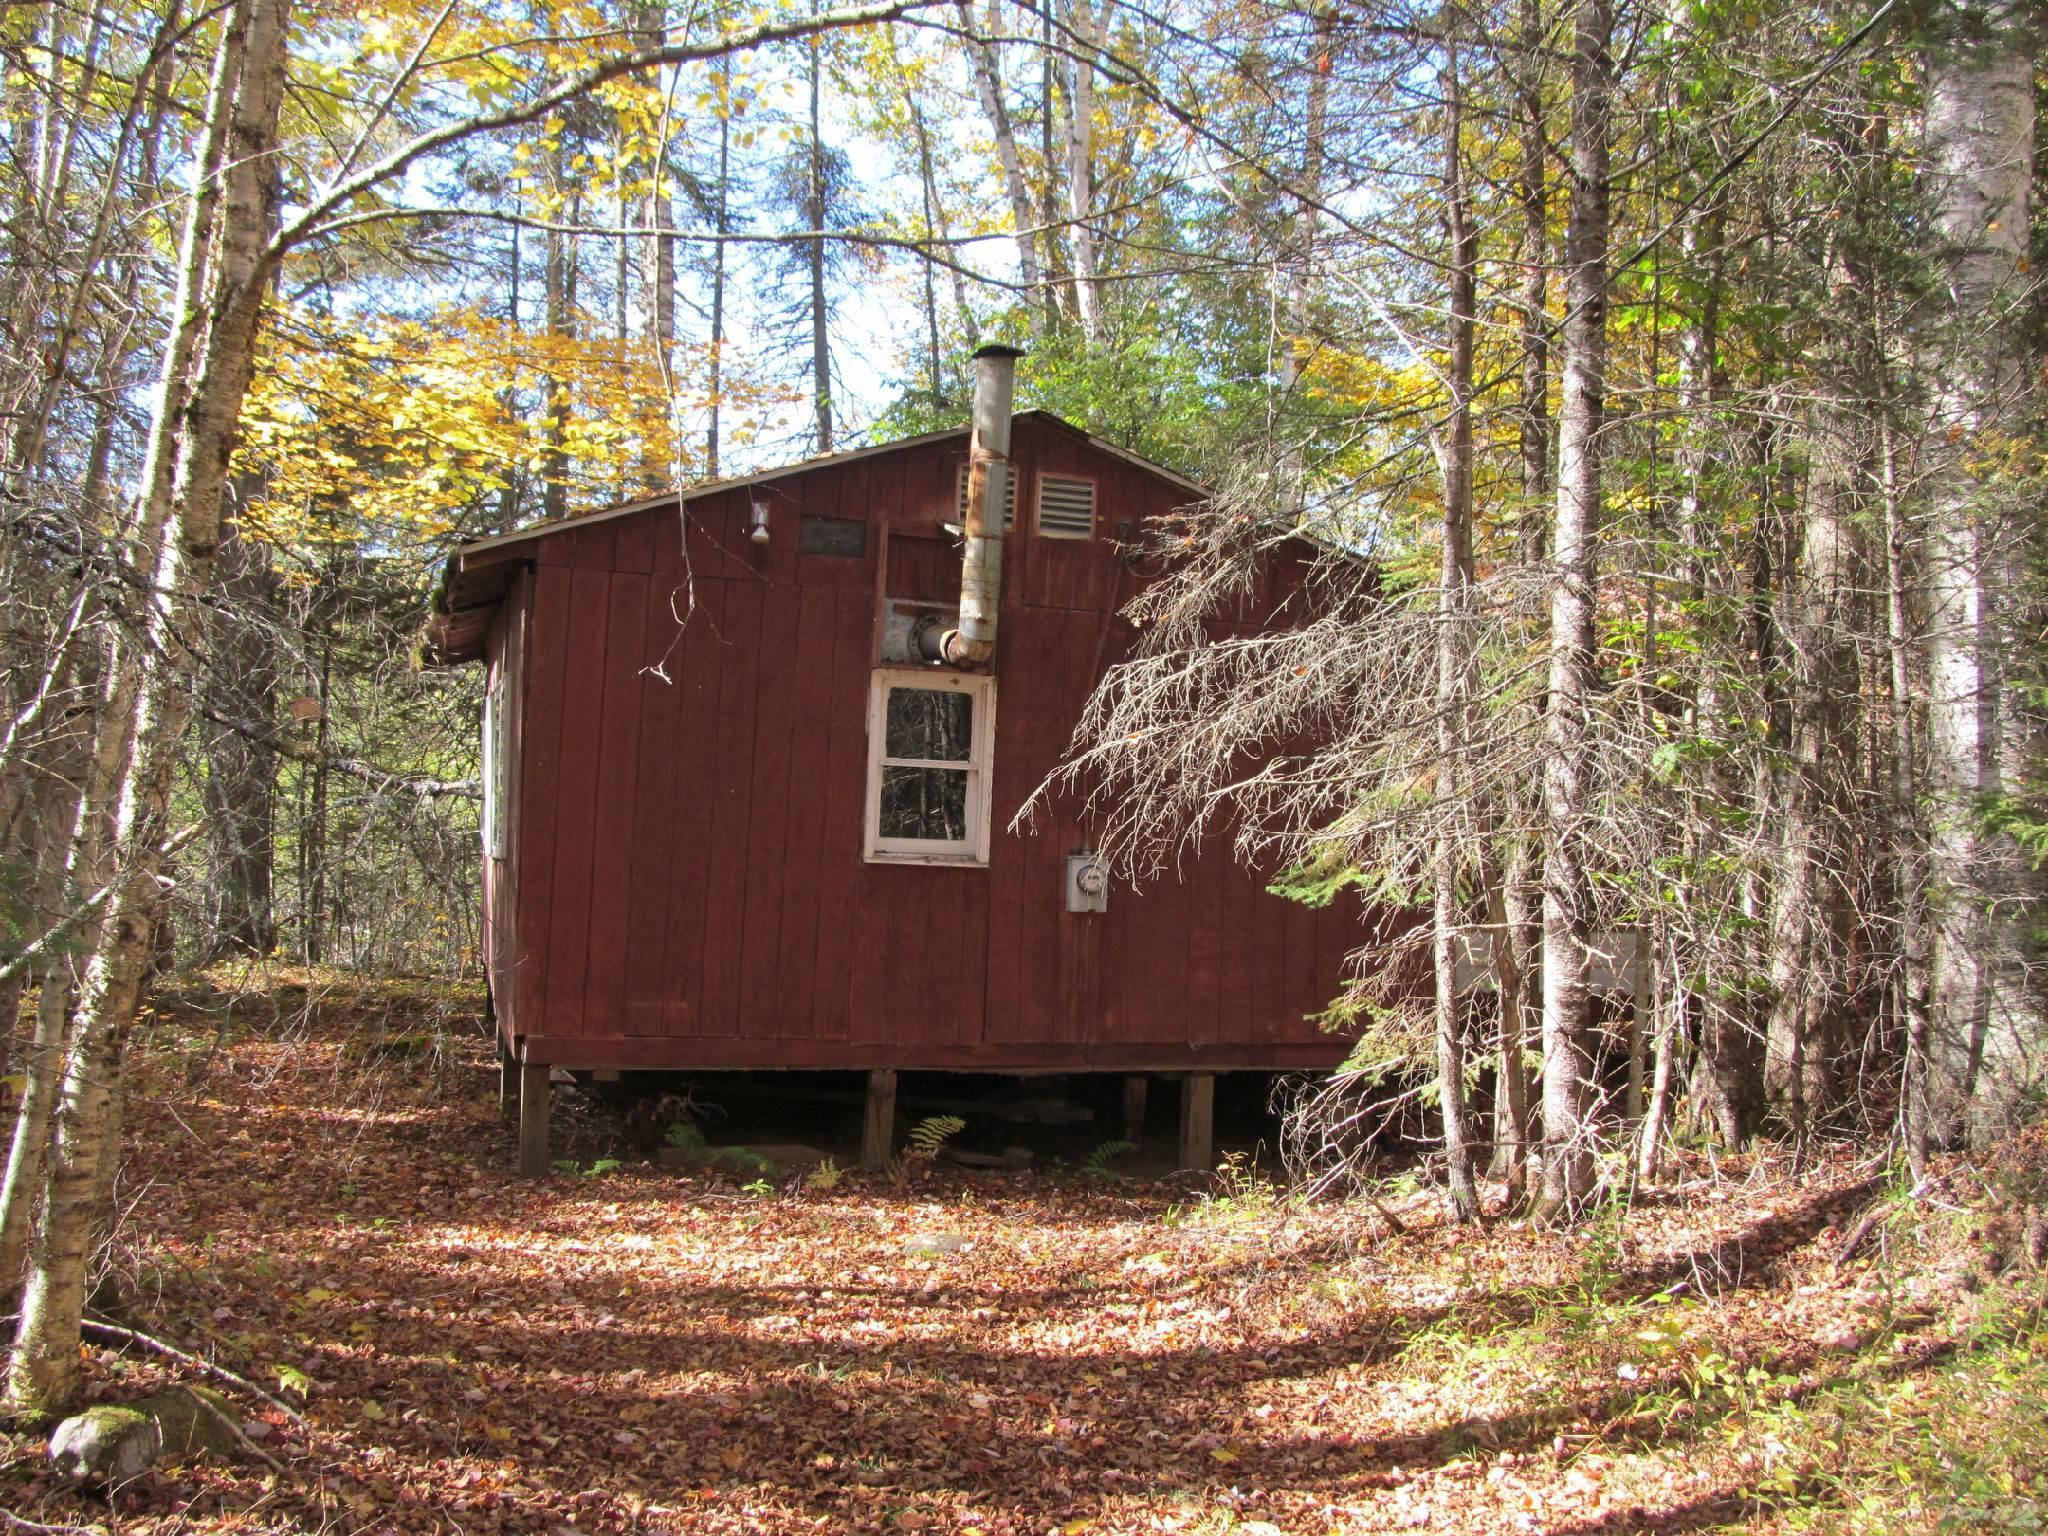 New york hamilton county sabael 12864 - 213 Round Lake Brook Assoc Rd